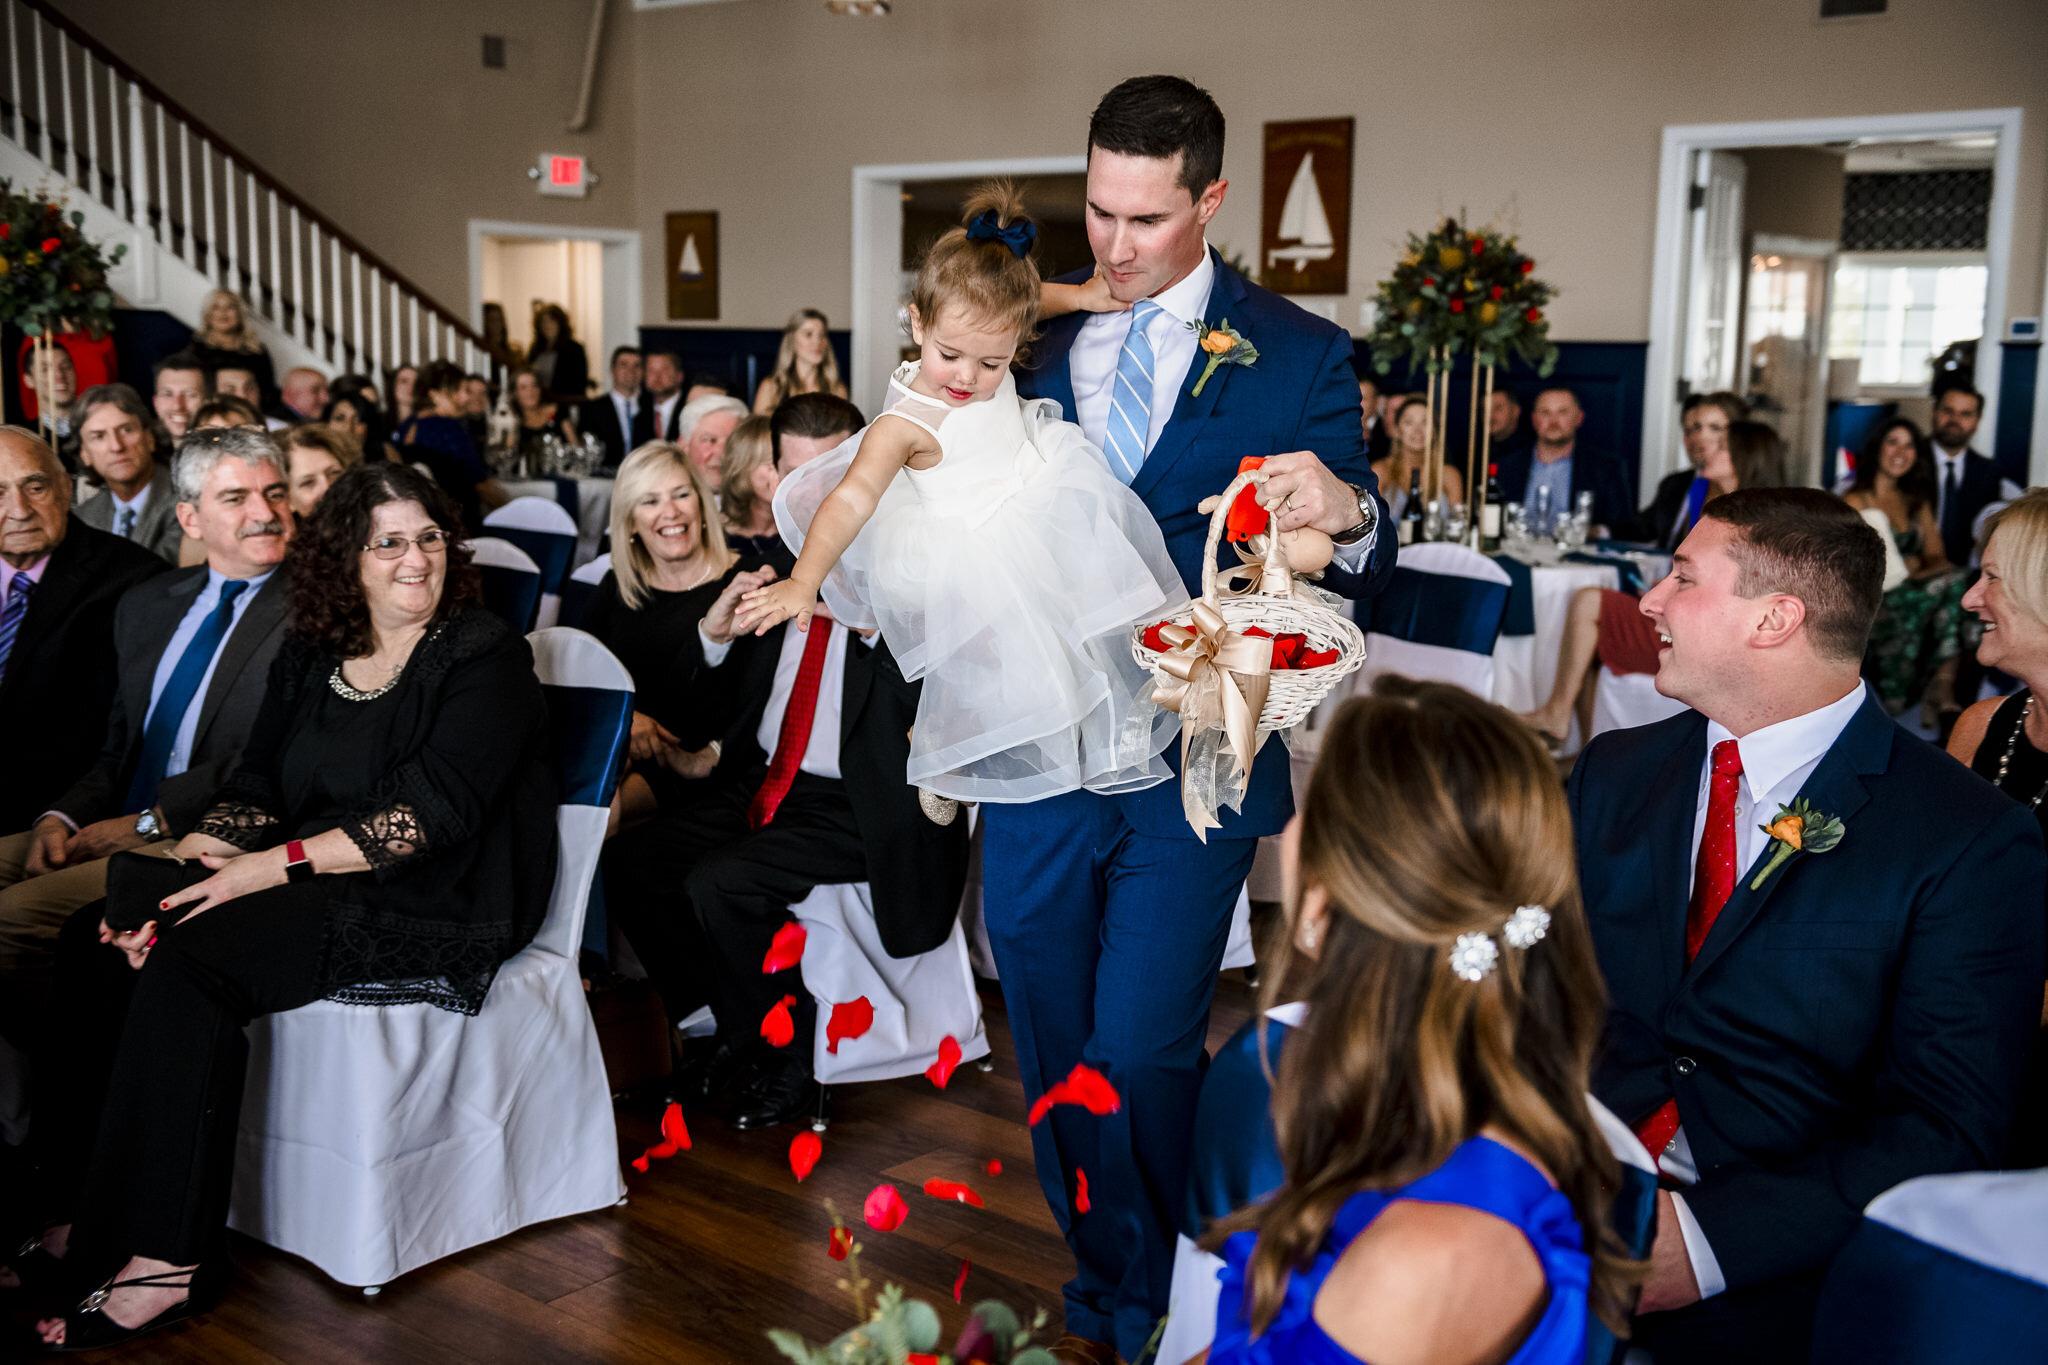 Snell-Ocean-City-Yacht-Club-New-Jersey-Wedding-Photographer-18.JPG